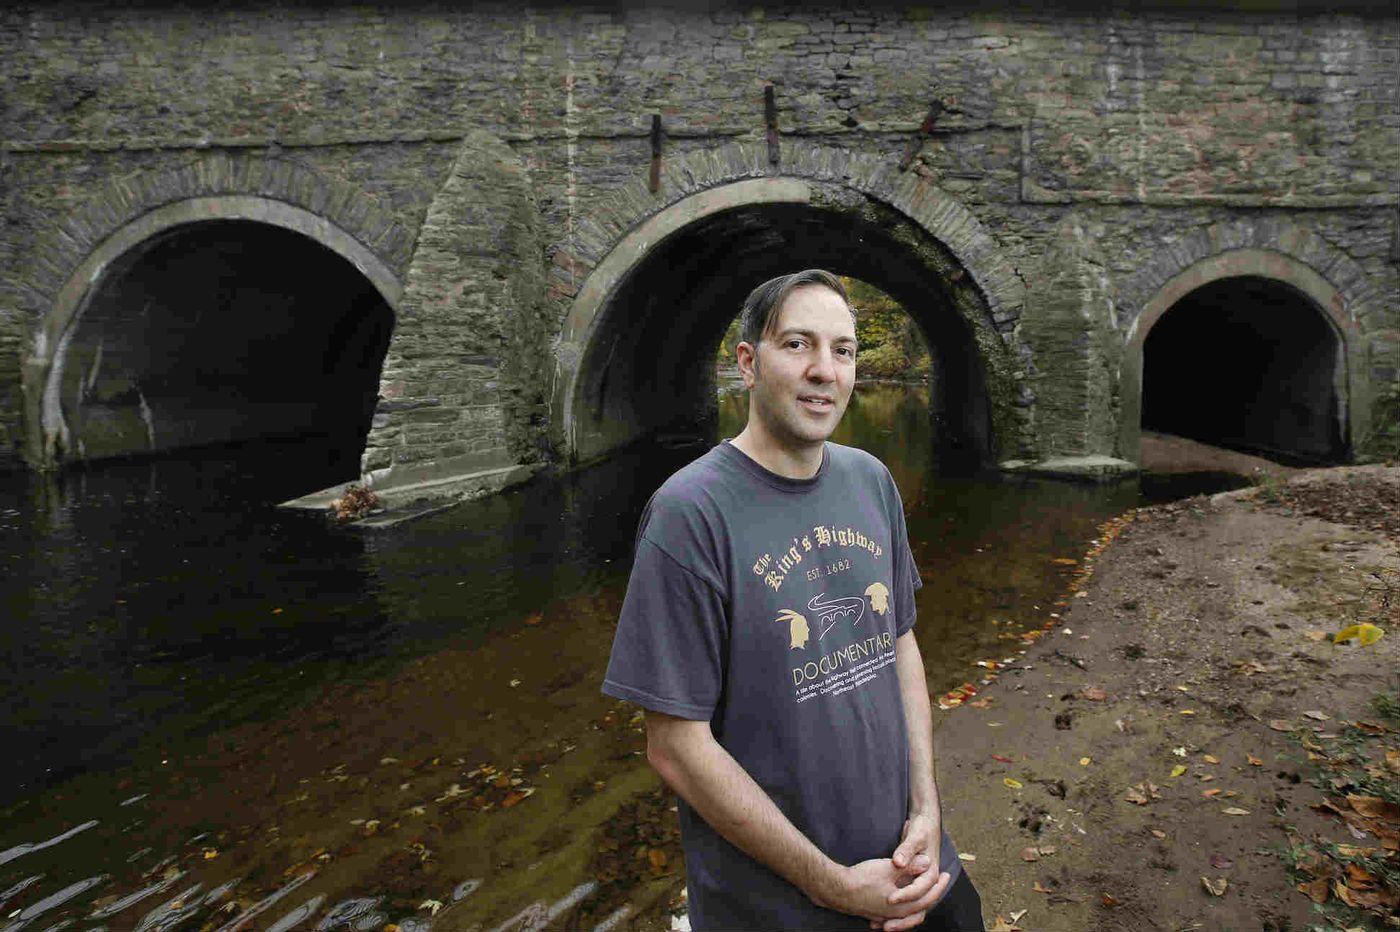 Celebrating the nation's oldest road bridge - in NE Philly